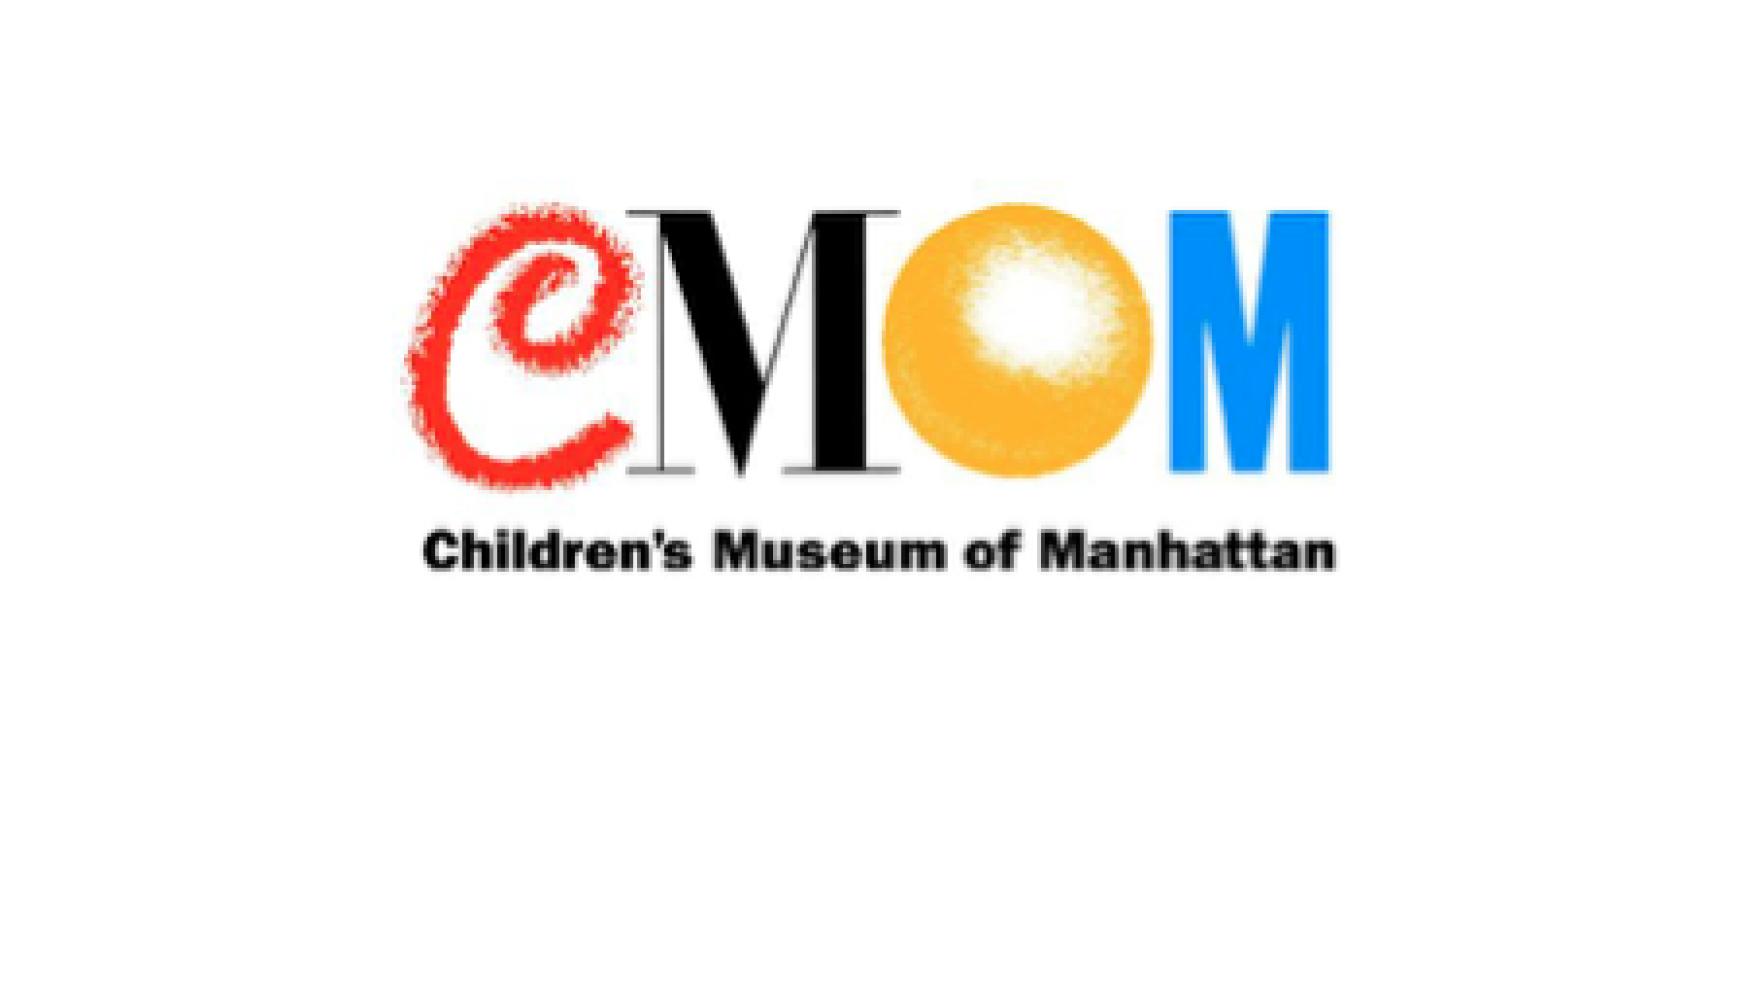 Children's Museum of Manhattan to launch of 'Namaste Express' this summer